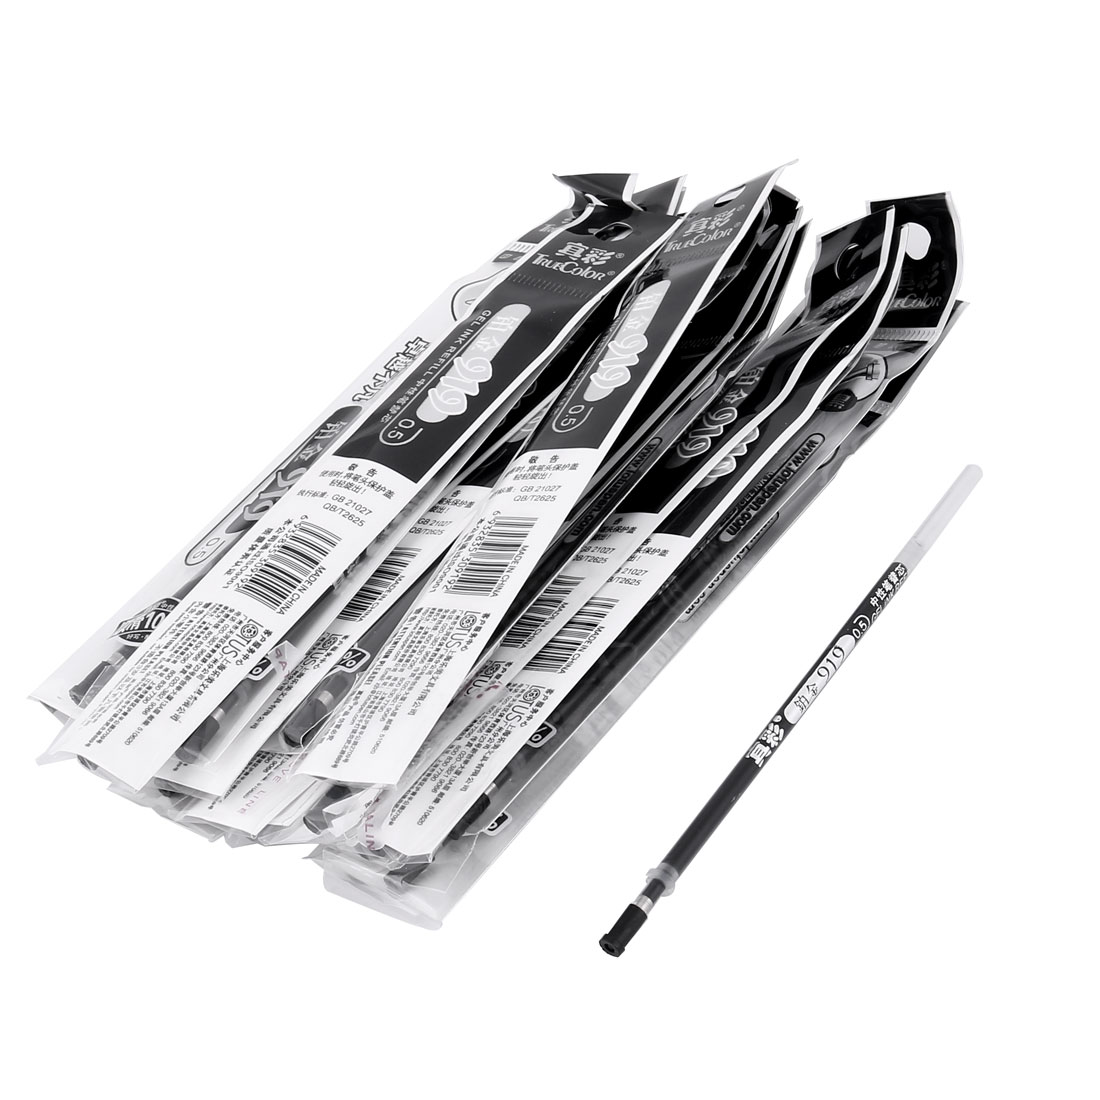 Stationery 0.5mm Tip Gel Black Ink Pen Refill x 20